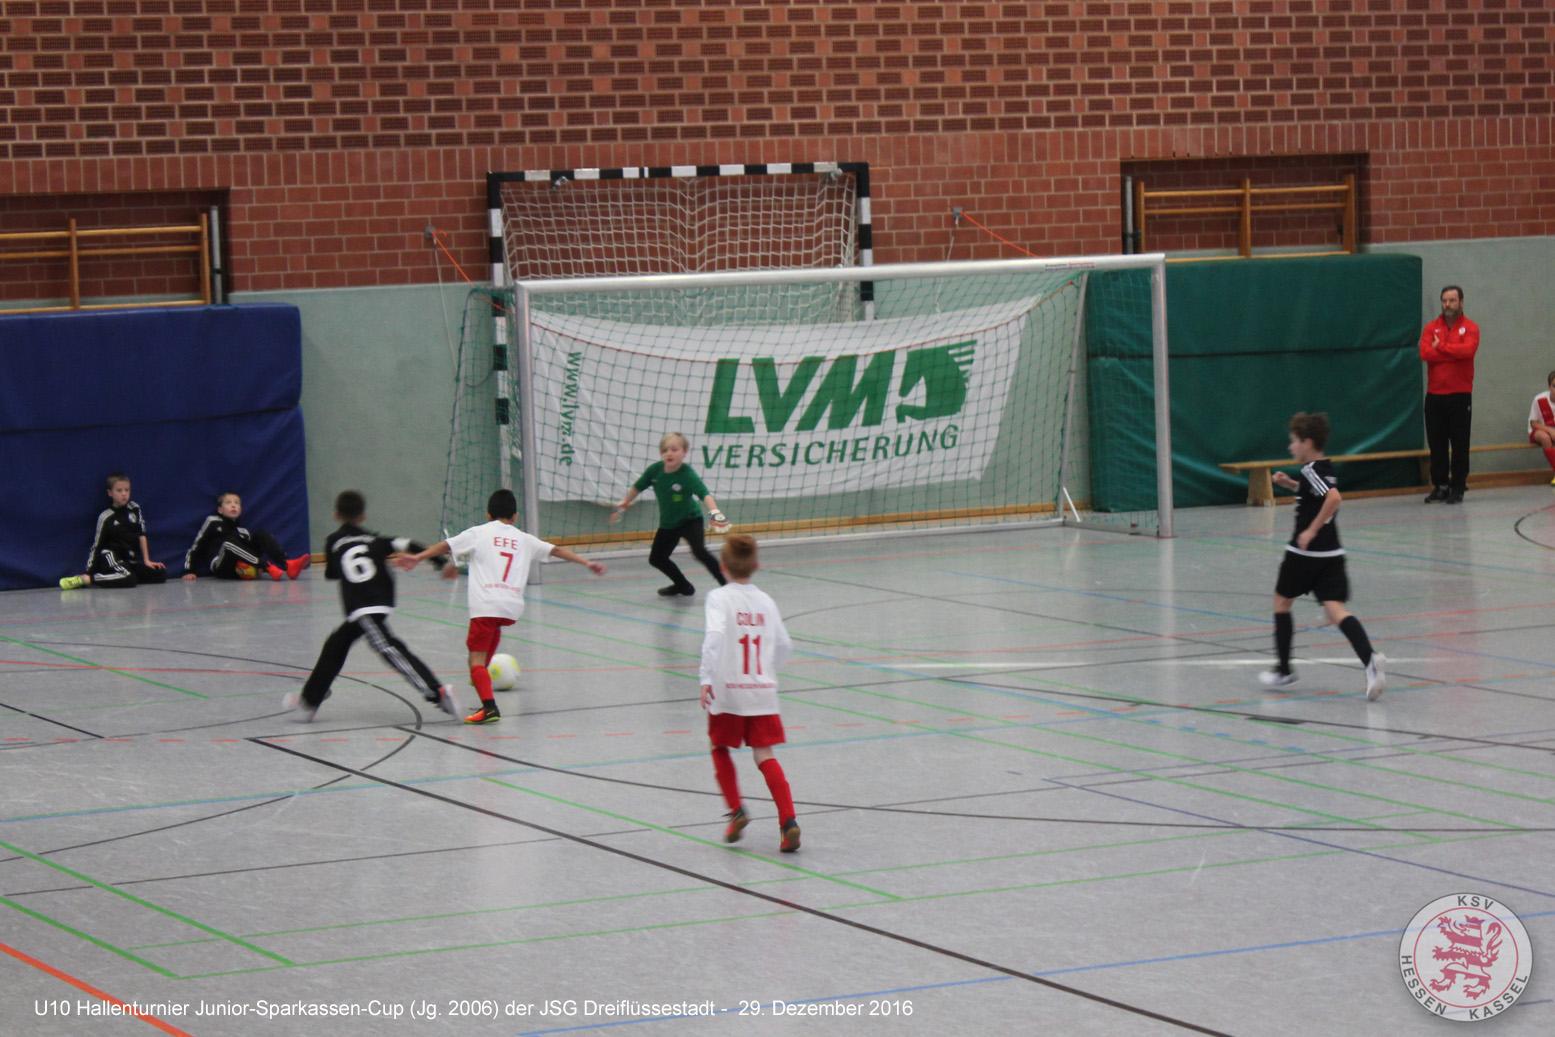 U10 Junior Sparkassen Cup Dreifl�ssestadt f�r U11